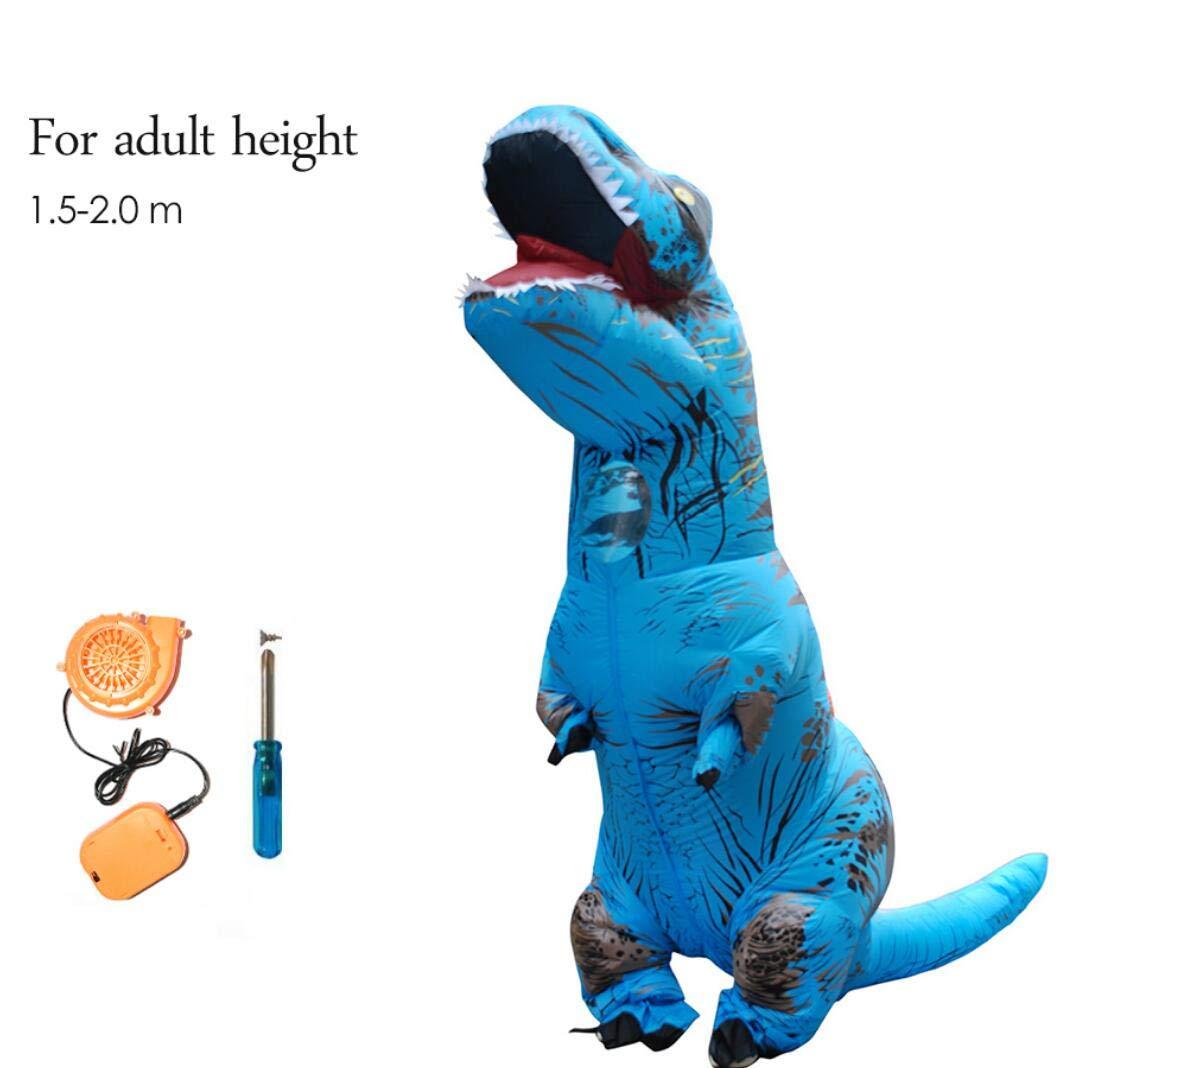 About Beauty Aufblasbare Dinosaurier T Rex Kostüm Jurassic World Park Blowup Dinosaurier Cosplay Aufblasbare Kostüm Party-Kostüm Für Erwachsene Kinder